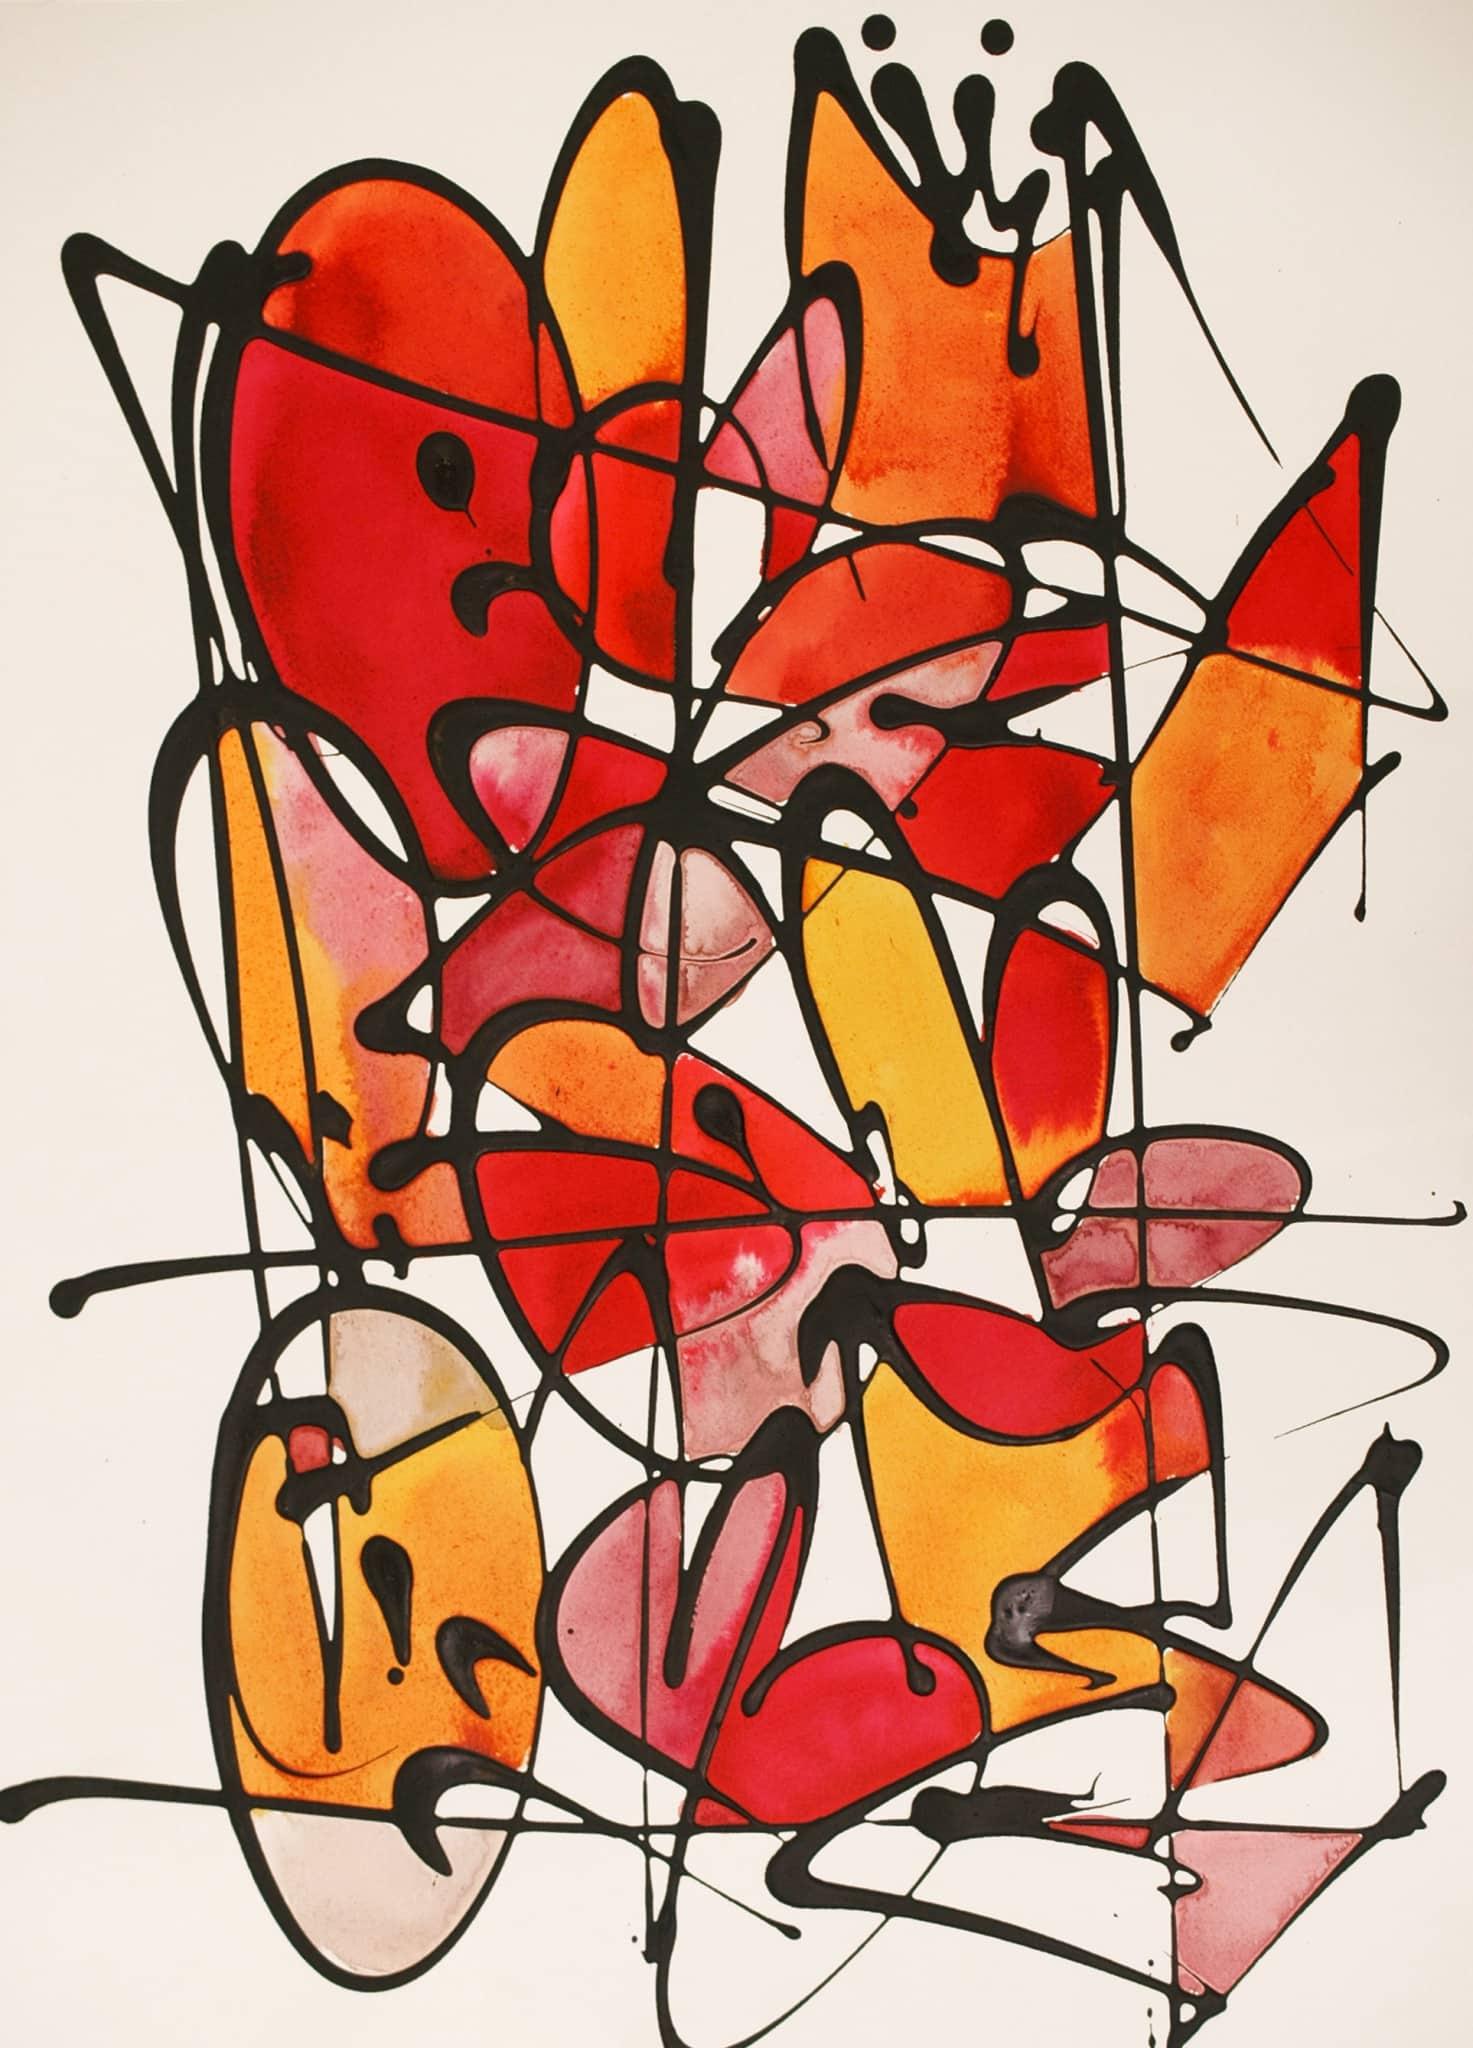 Galerie Art Jingle NEBAY (Réf. NB02) 65x50 cm 2021